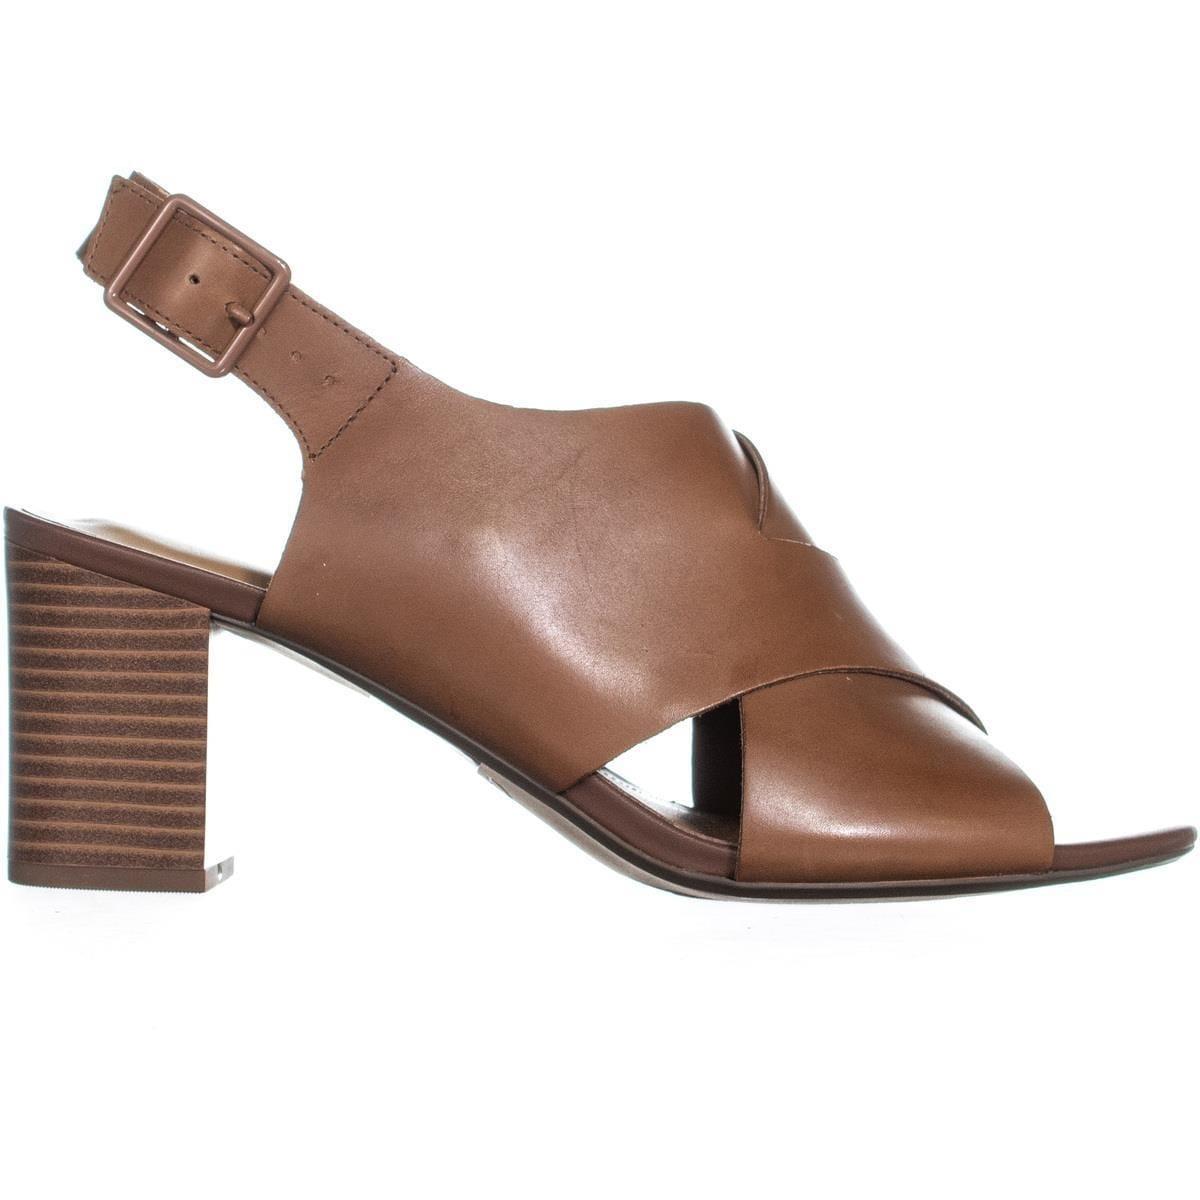 eeea7a99d2e3 Shop Clarks Deva Janie Block Heel Sandals